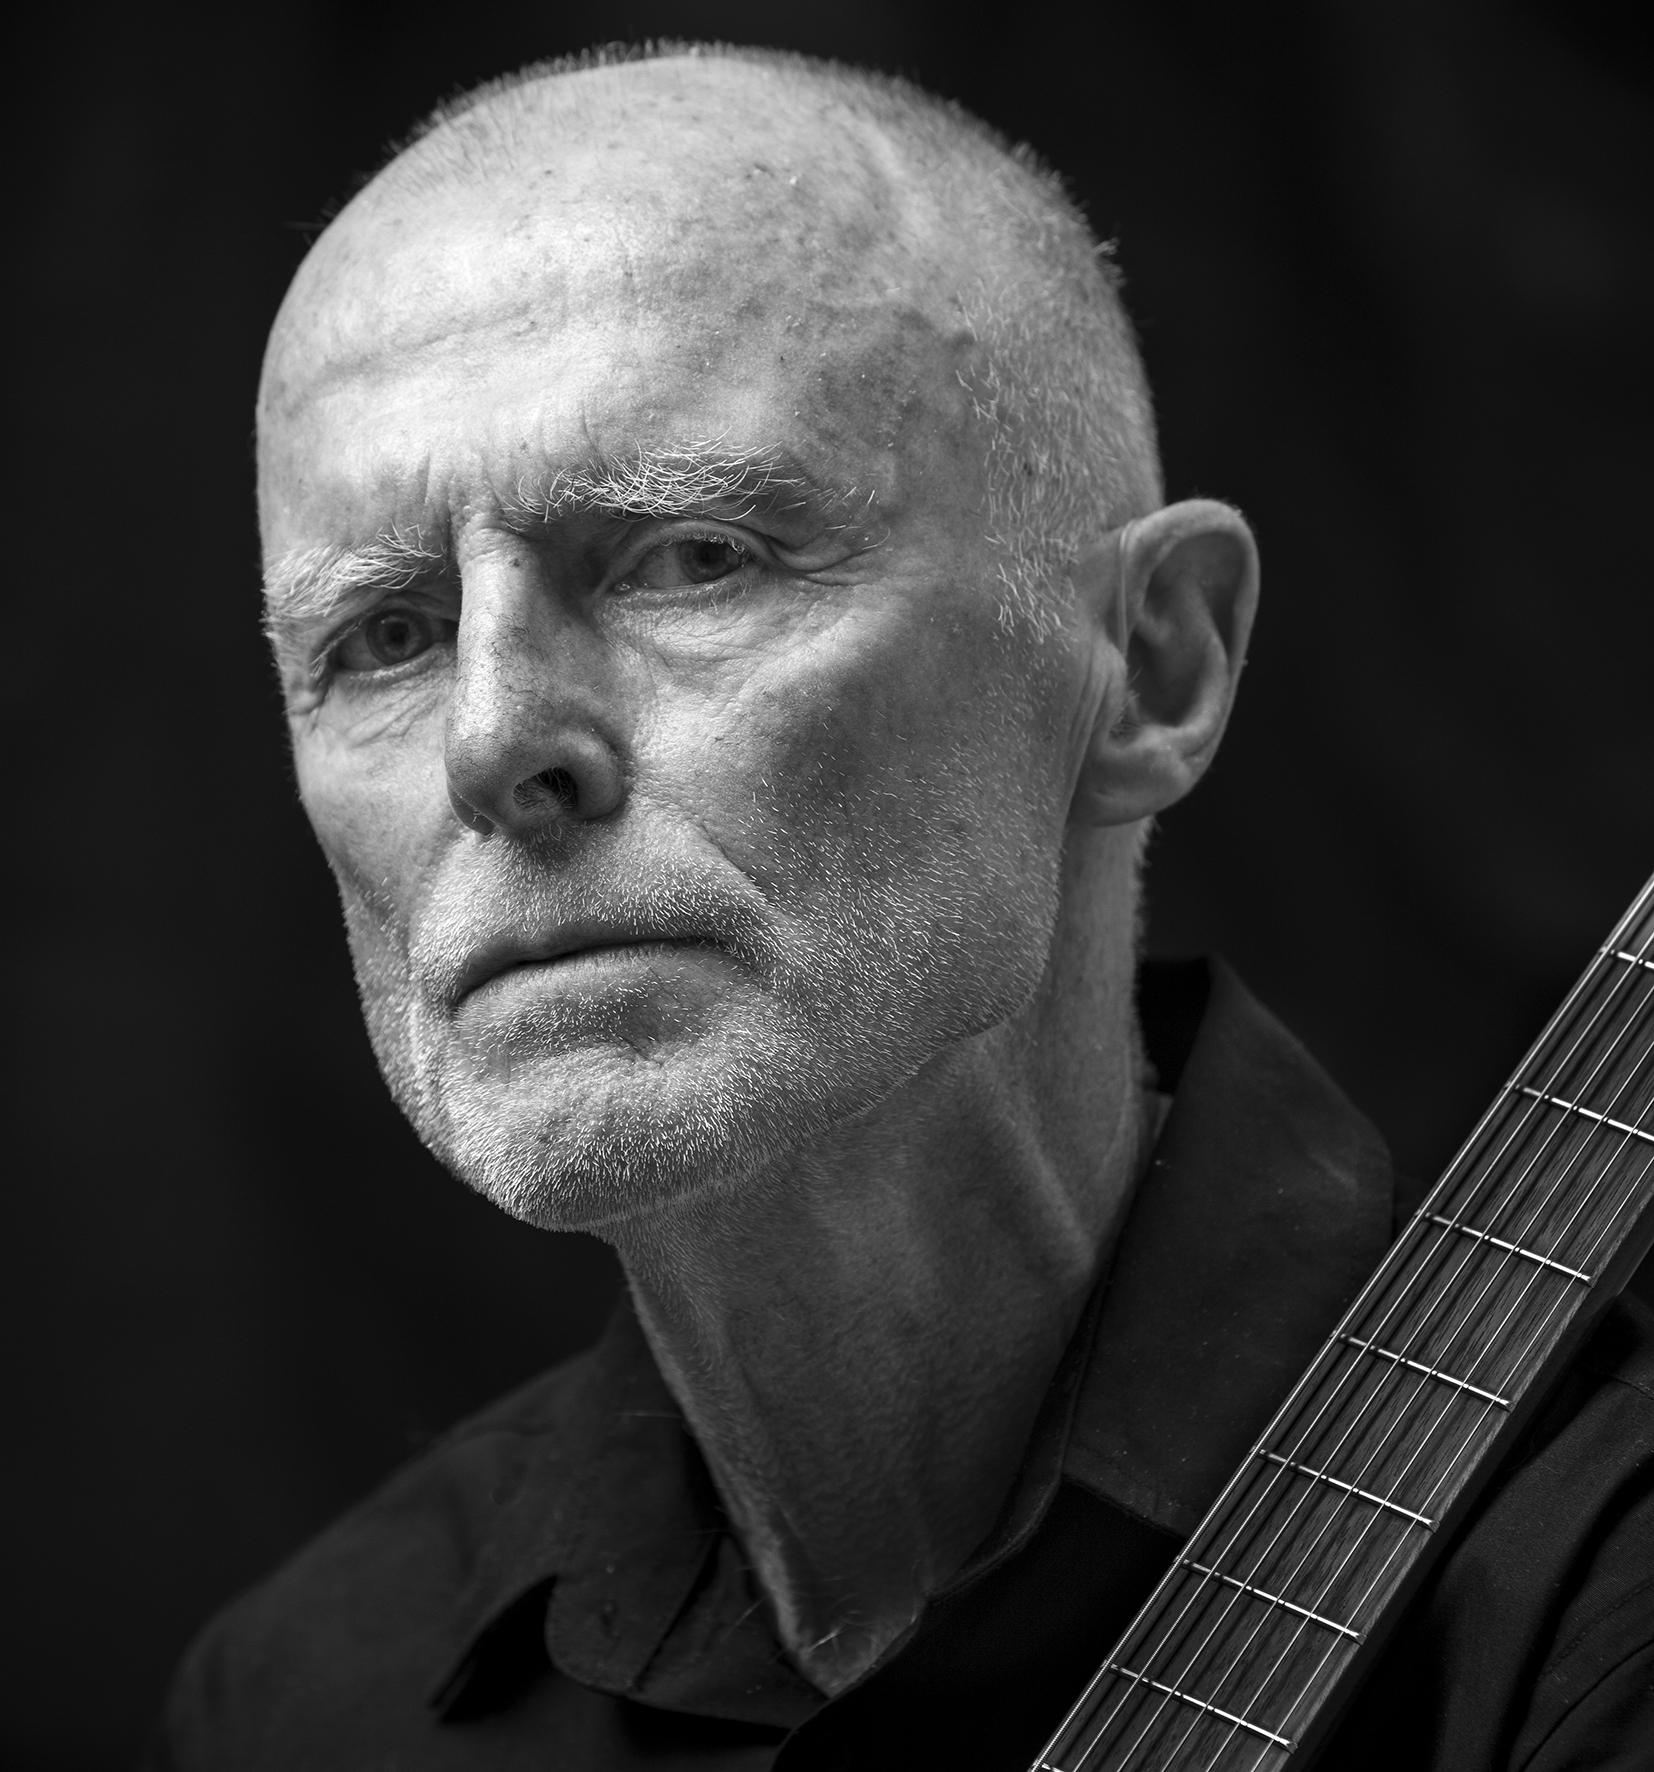 Saul Roche - songwriter / painter